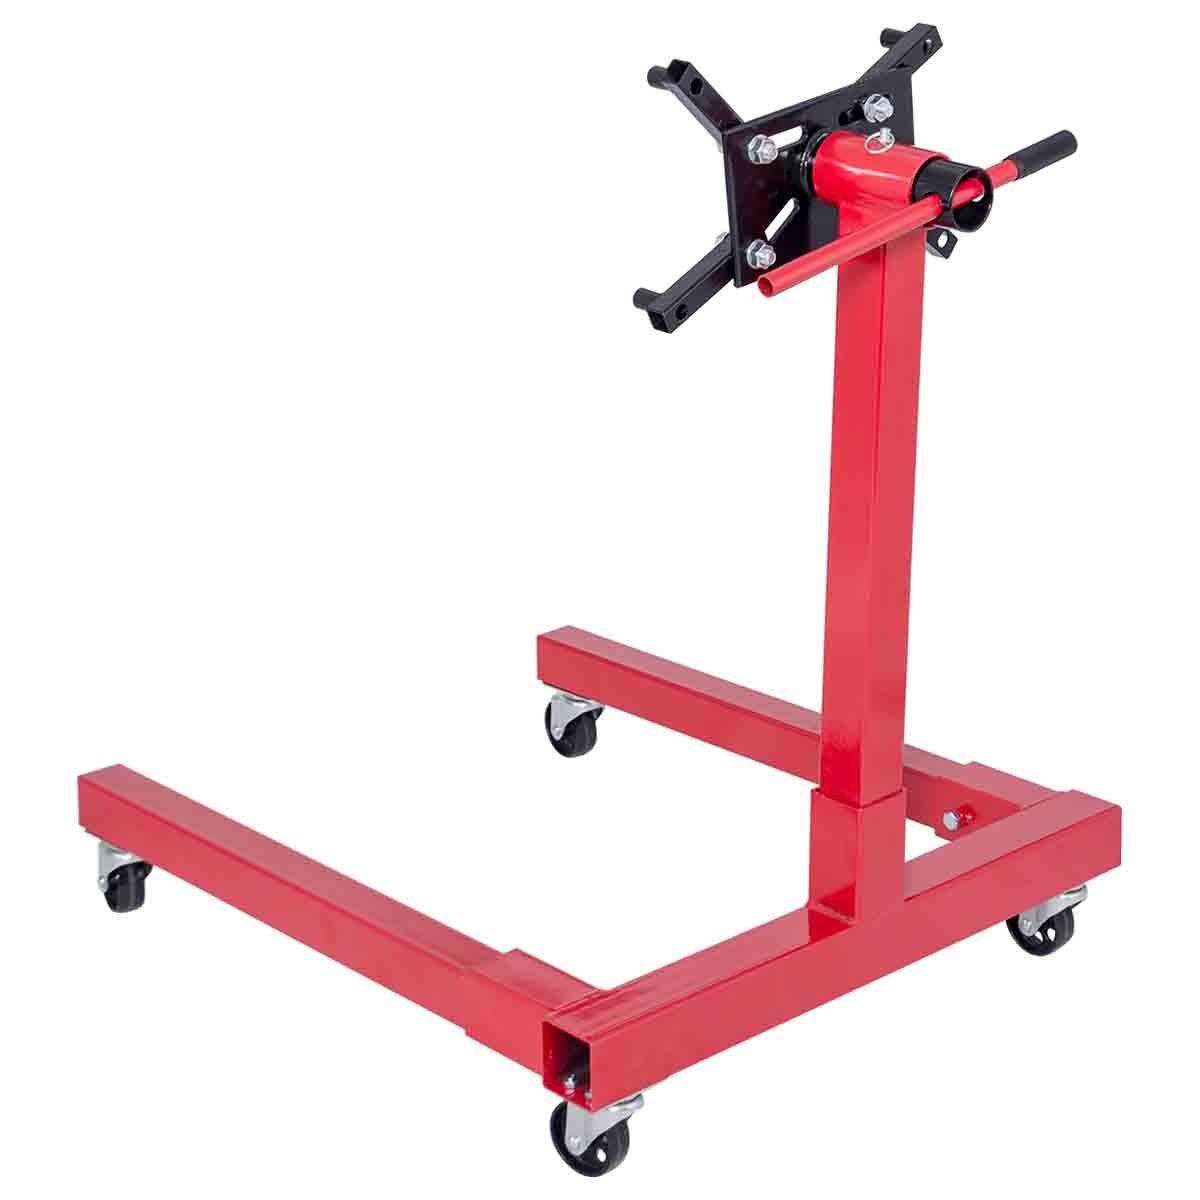 Toolsempire Engine Stand Hoist Automotive Lift Rotating 1250 lbs Capacity Wheel Shop Motor Stand